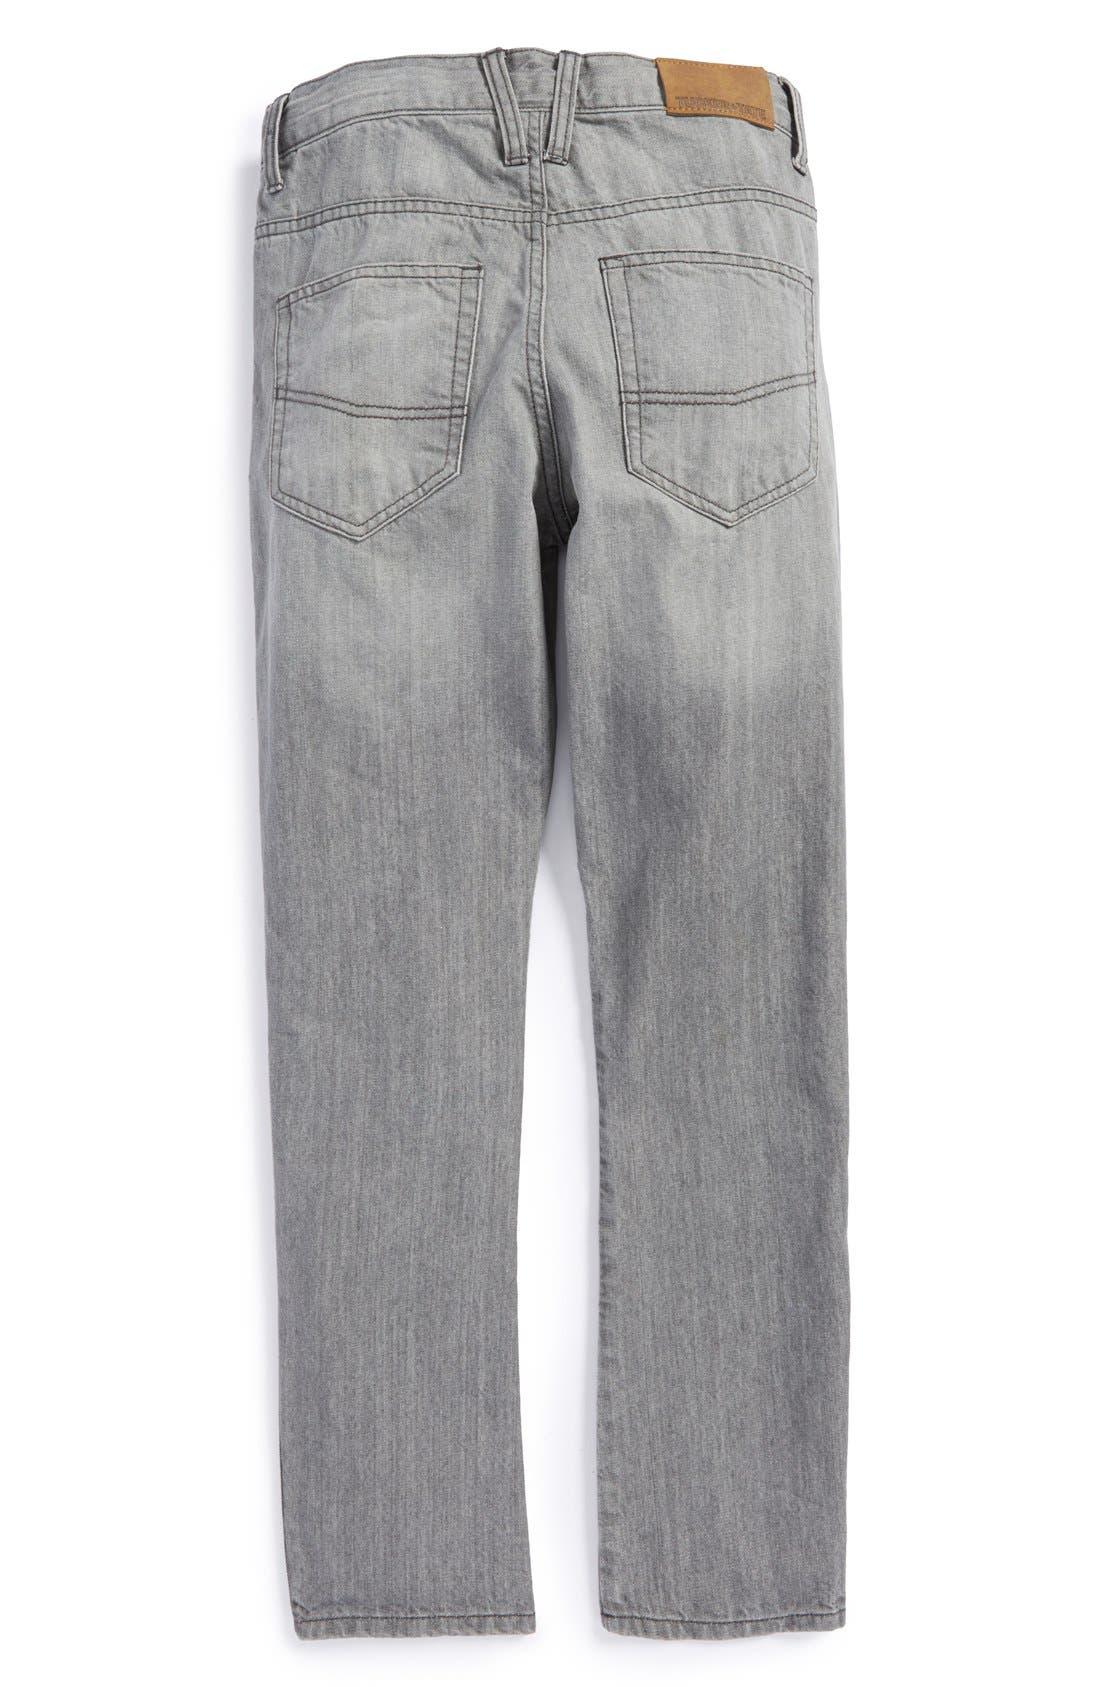 Alternate Image 1 Selected - Tucker + Tate 'Rocco' Skinny Jeans (Big Boys)